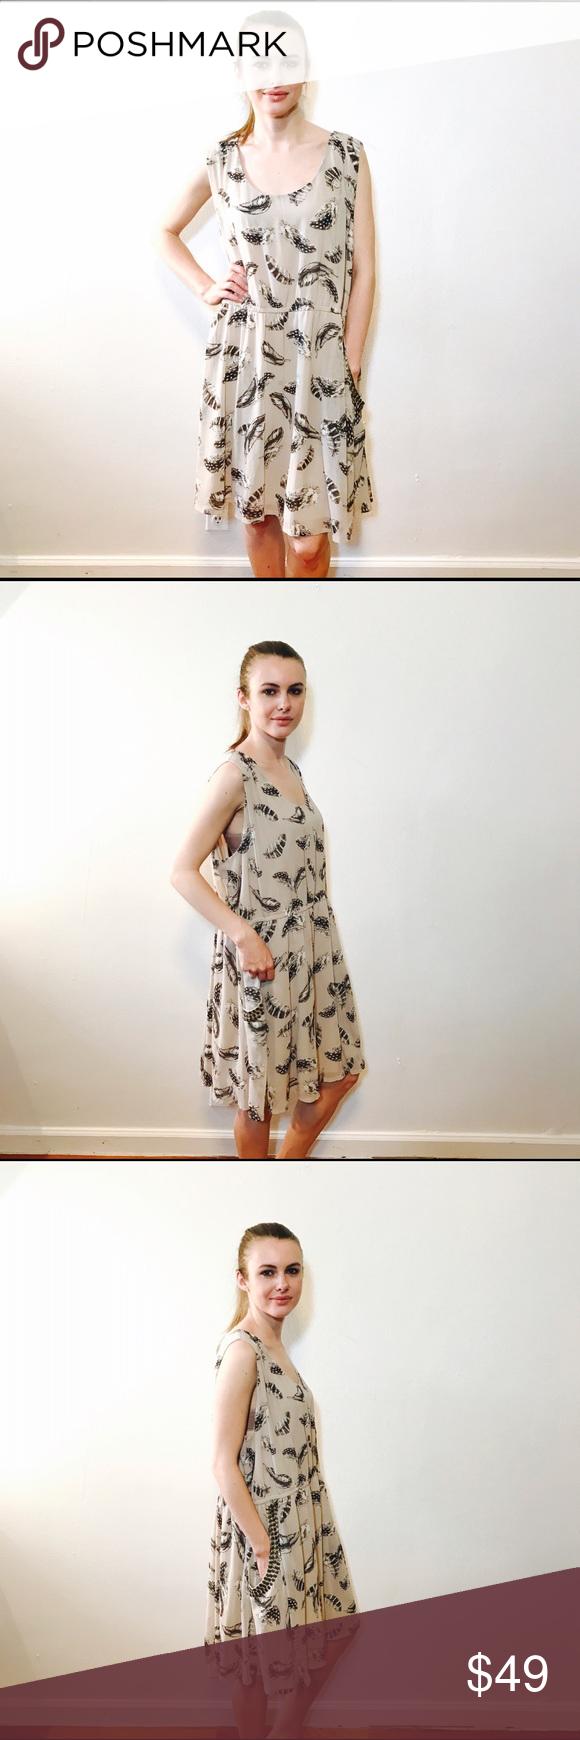 AX PARIS CURVE FEATHER DRESS NWT, no issues. AX Paris Curve Dresses